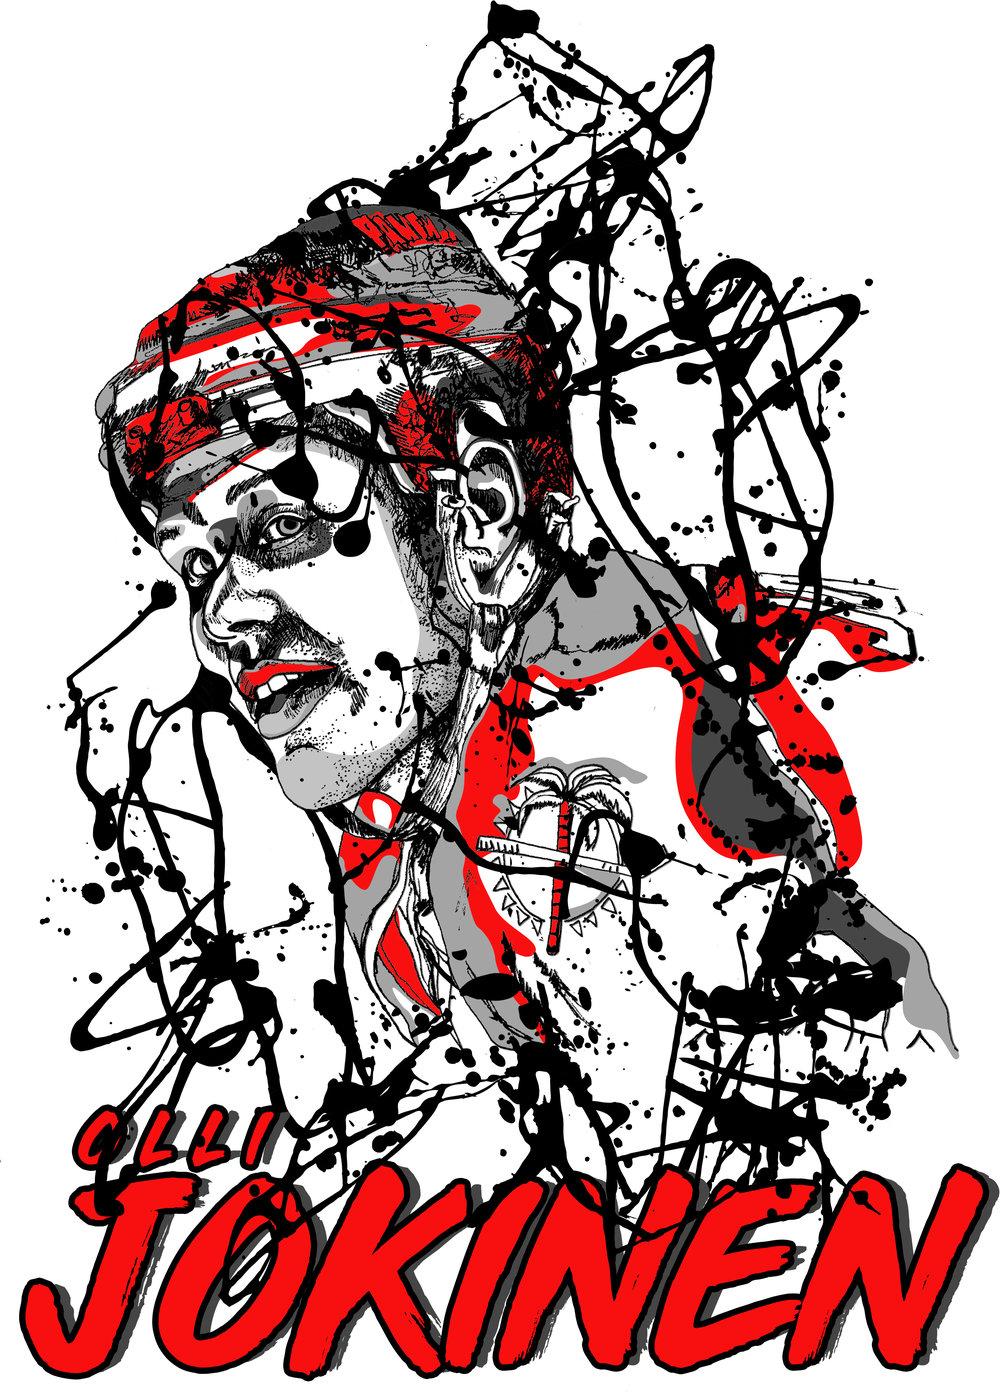 FLPA_Olli Jokinen_Legacy_Shirt_Design_PROOF.jpg